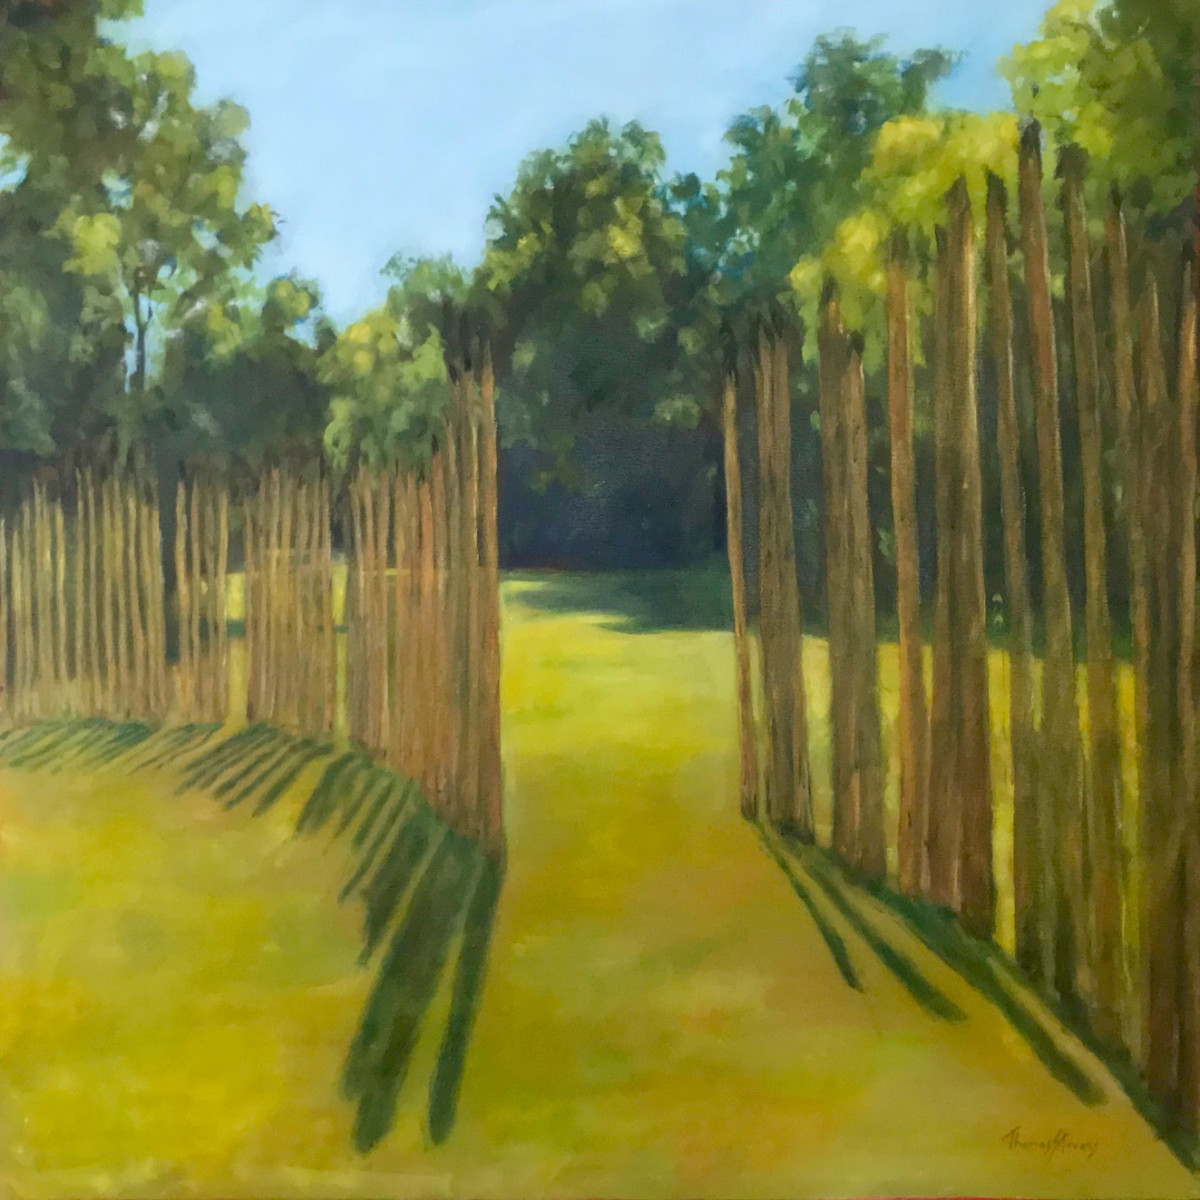 Sun Gate   (Occaneechi series - 36.072186N 79.097939W) by Thomas Stevens